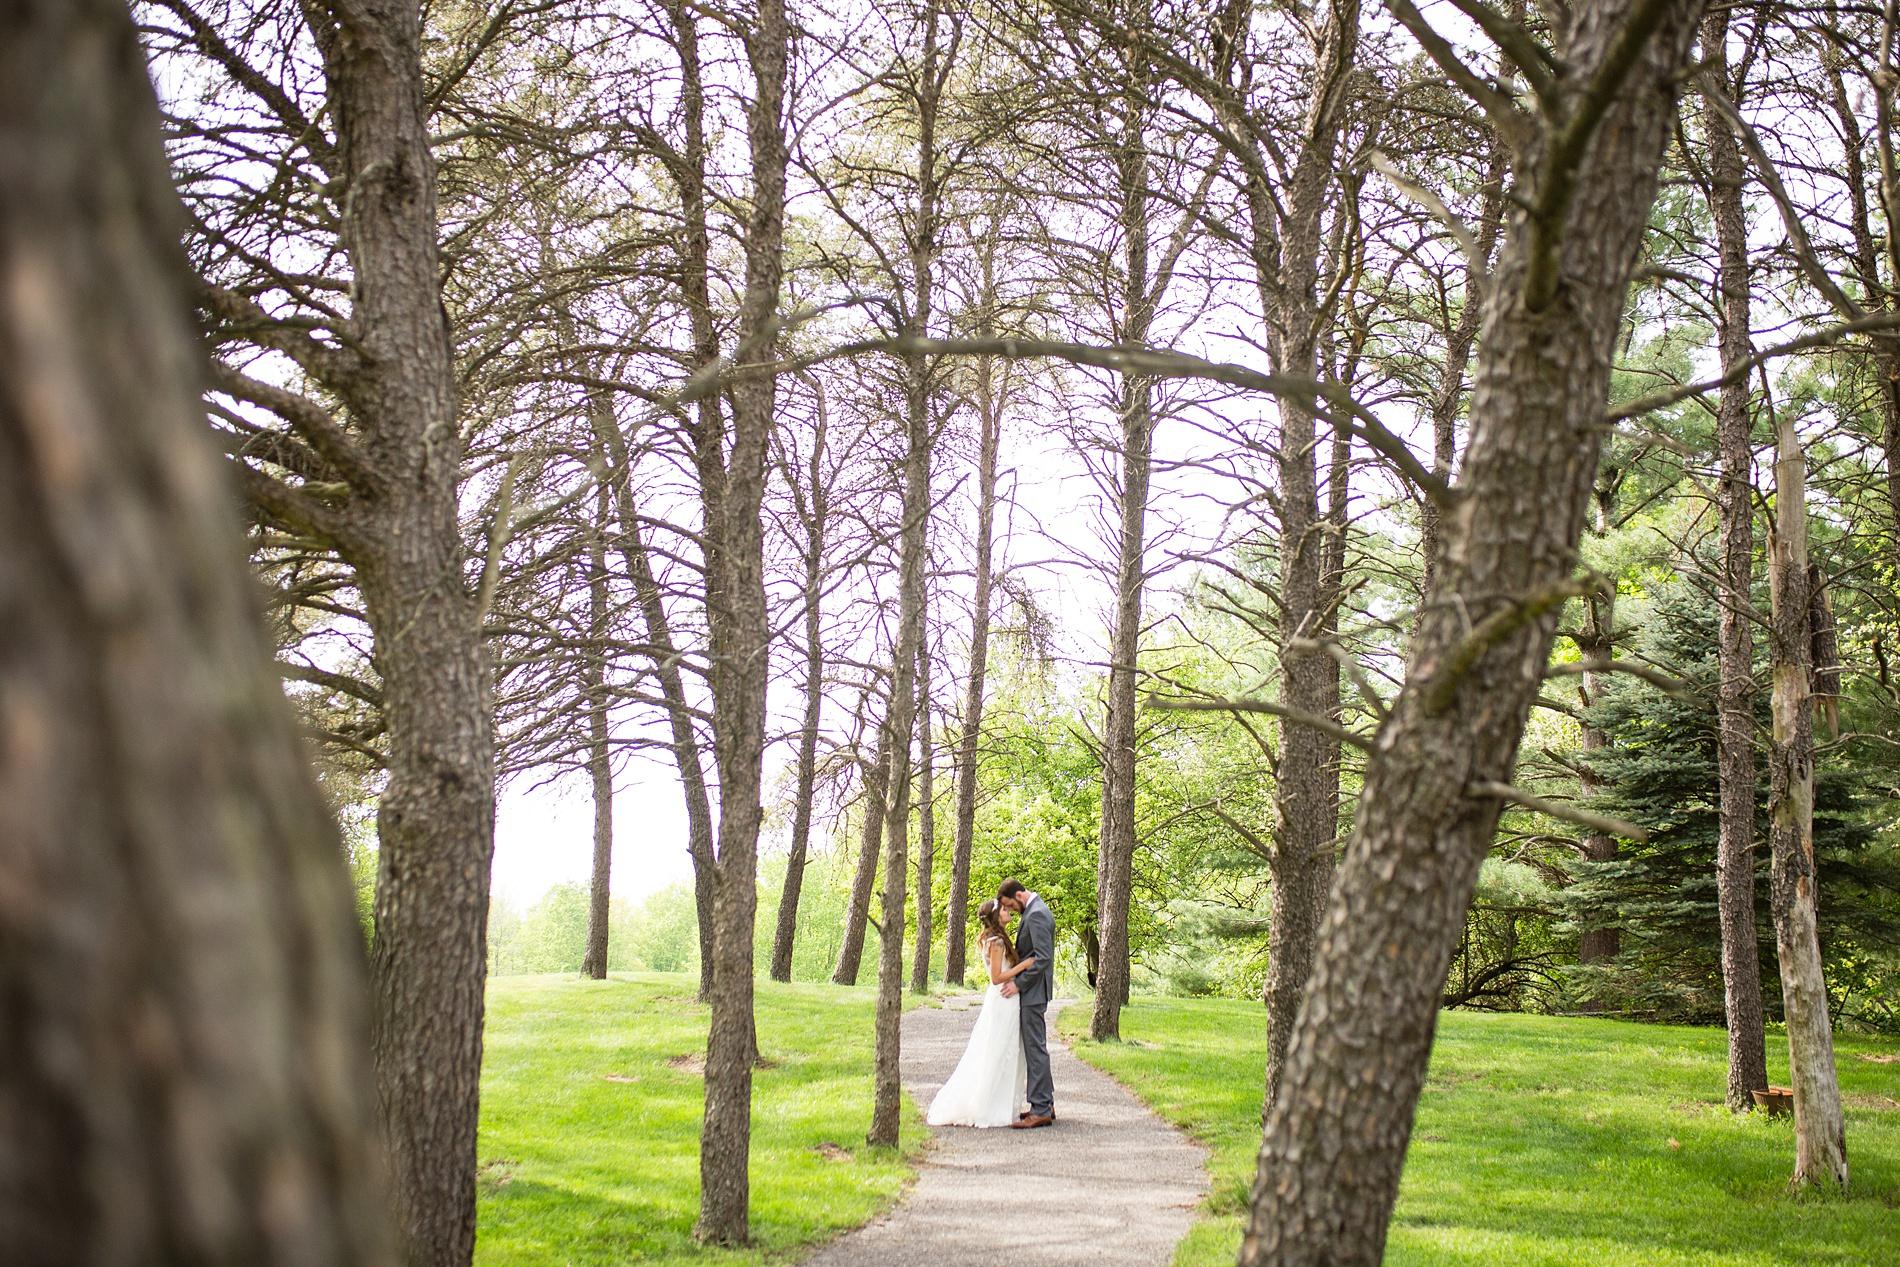 Brandon_Shafer_Photography_Brett_Autumn_Wedding_0032.jpg